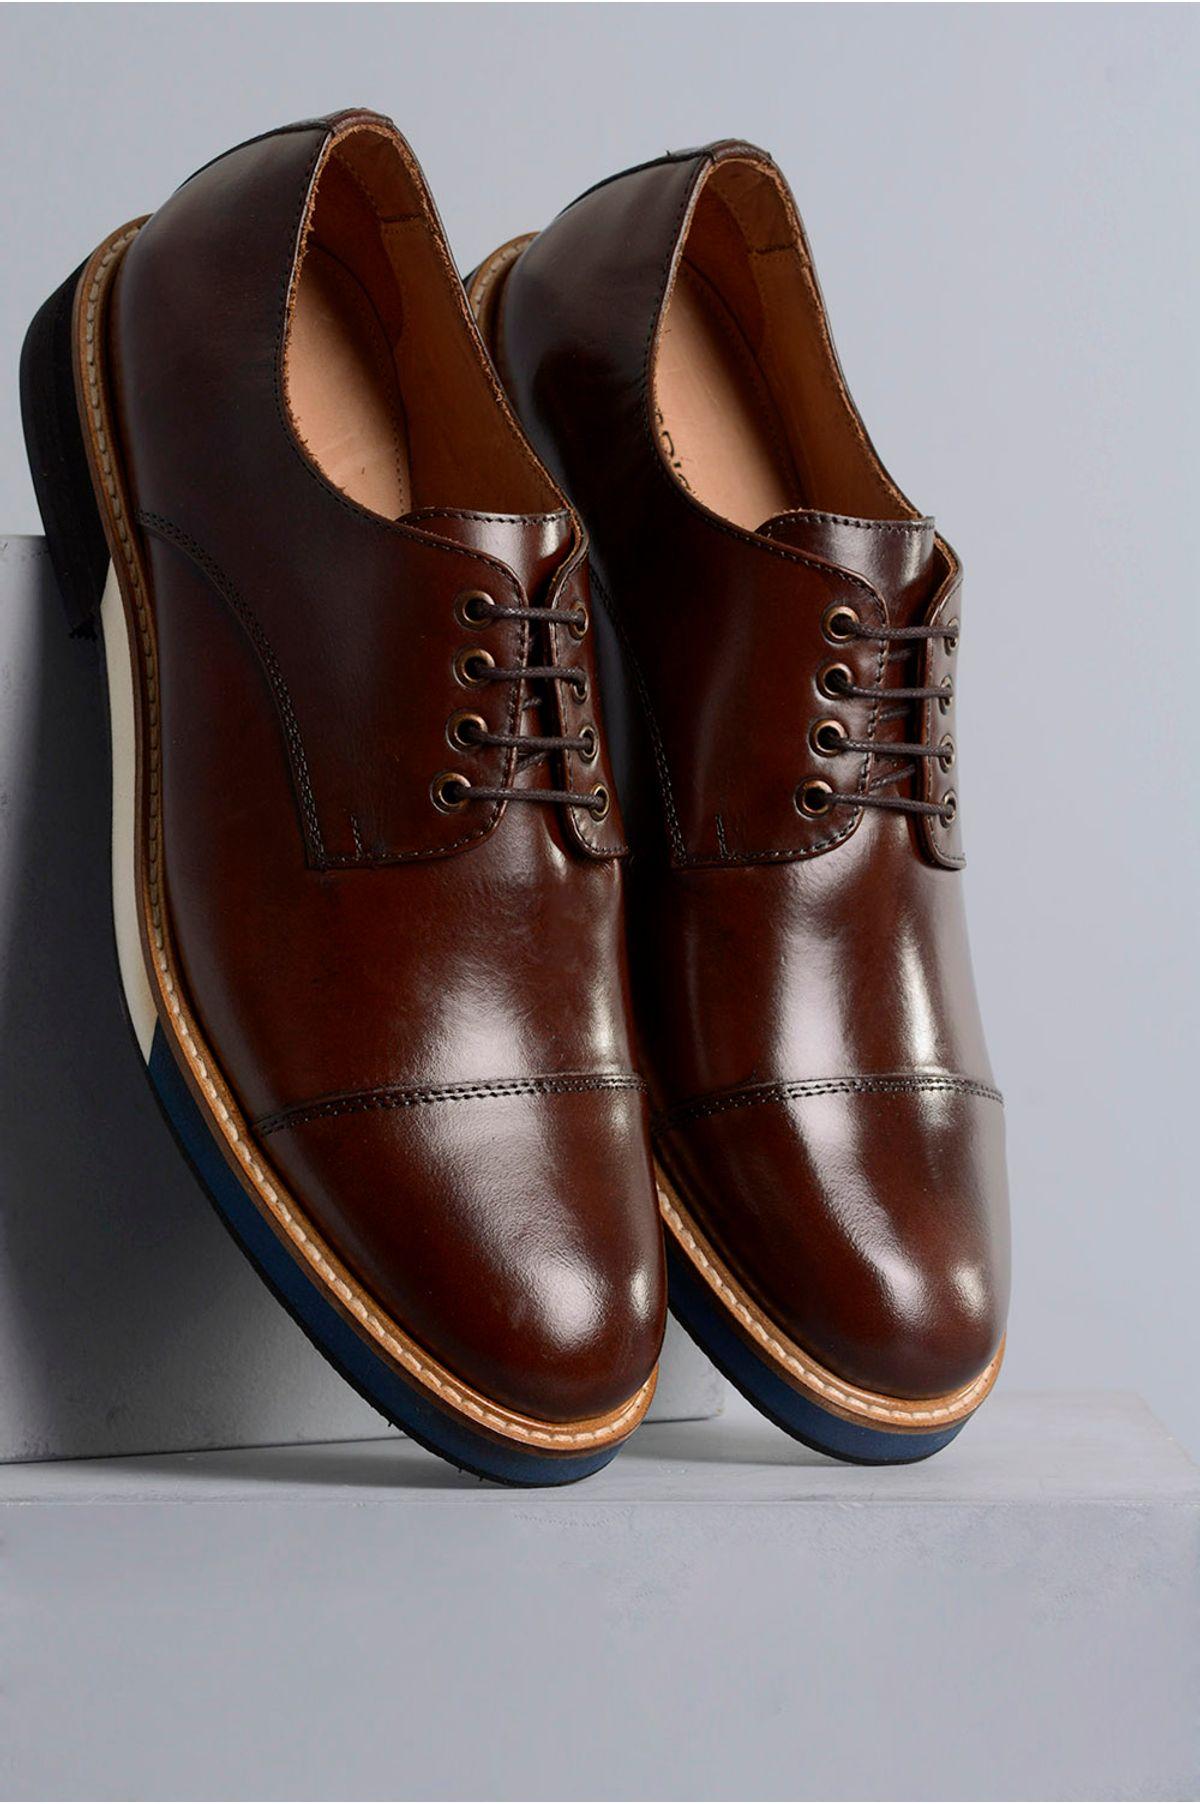 5d66f35fda Sapato Masculino Marcio Mundial CR-MOURA - Mundial Calçados